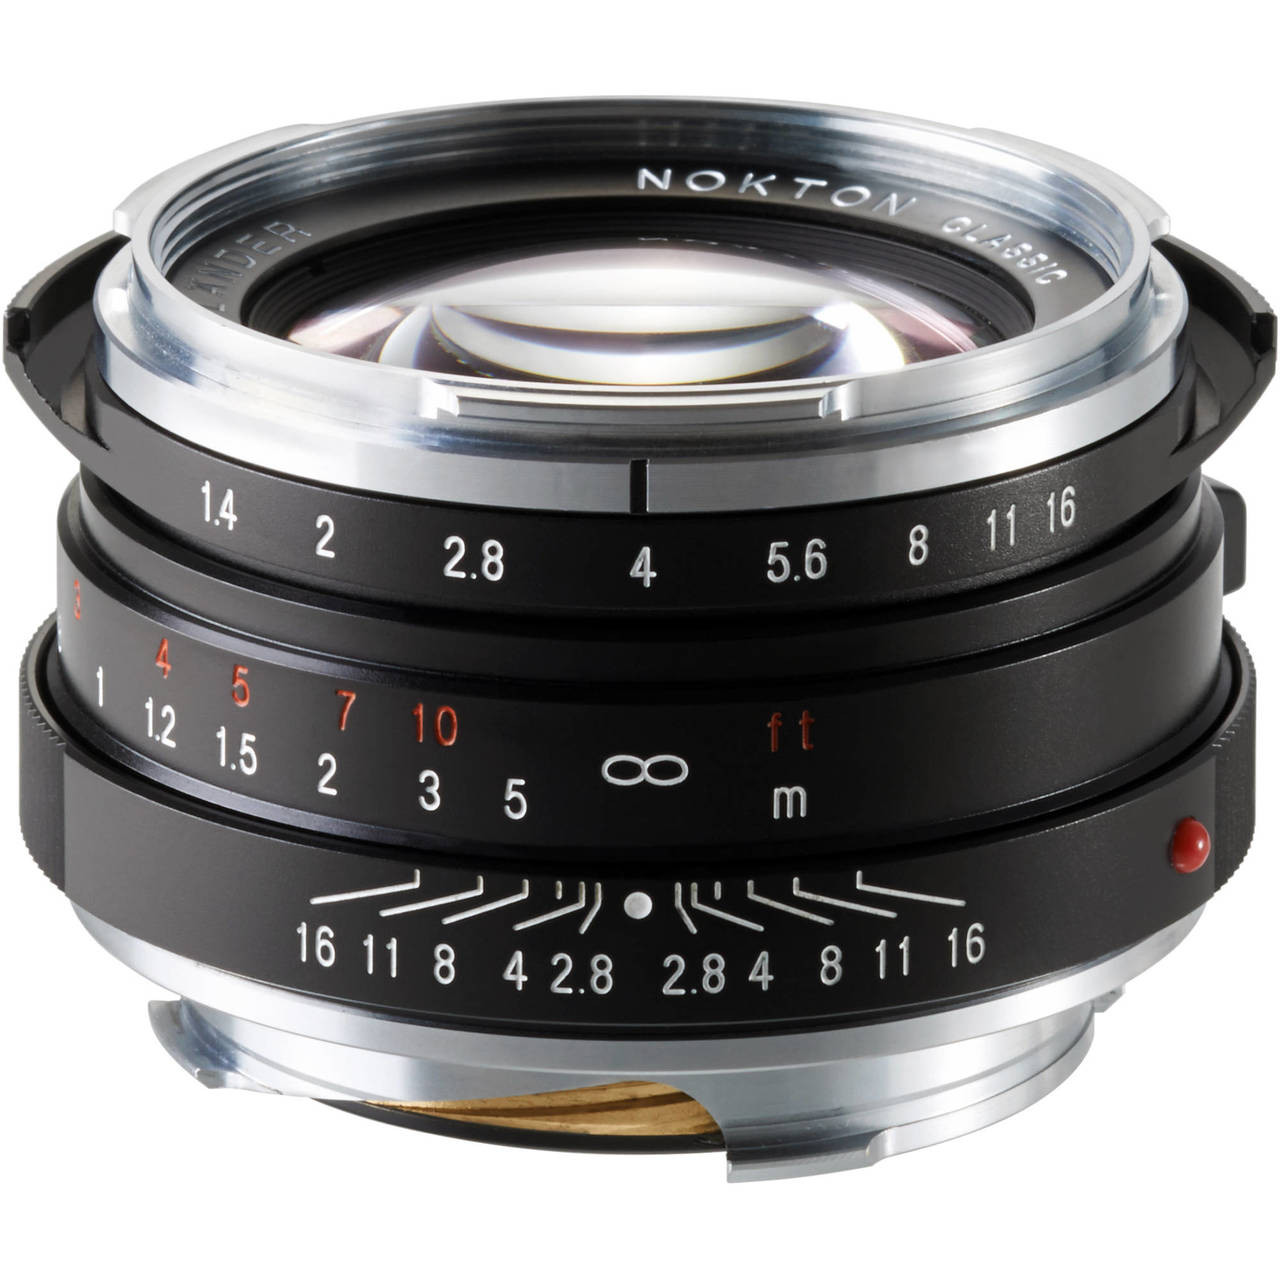 Voigtlander 40mm F1 4 Nokton Lens for M-Mount (New) - Camera Lane